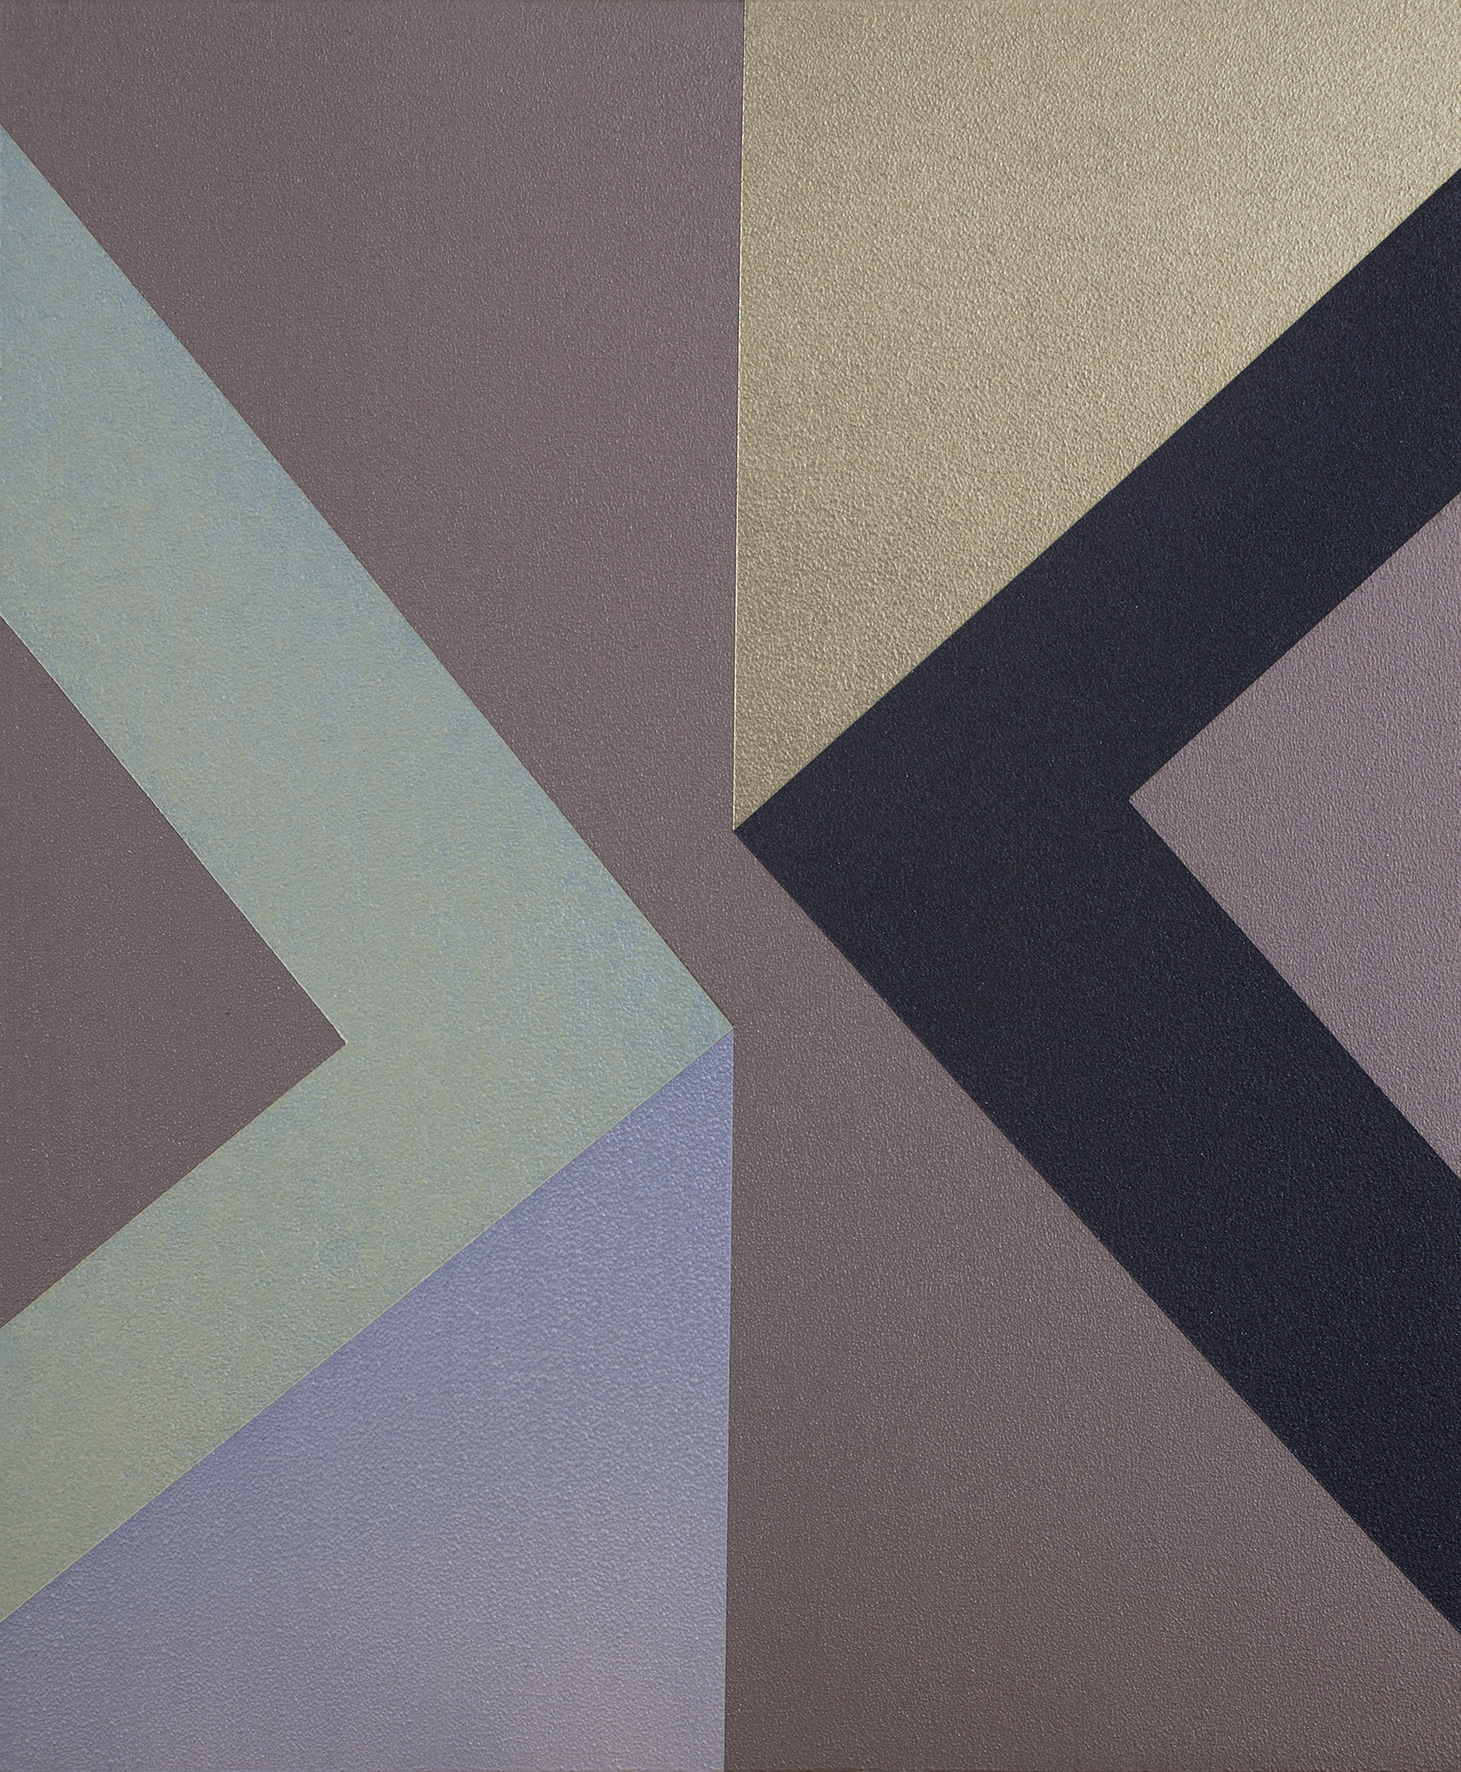 SAMARA ADAMSON-PINCZEWSKI  Gold Corner 2  2014 acrylic on wood panel 30 × 25 cm